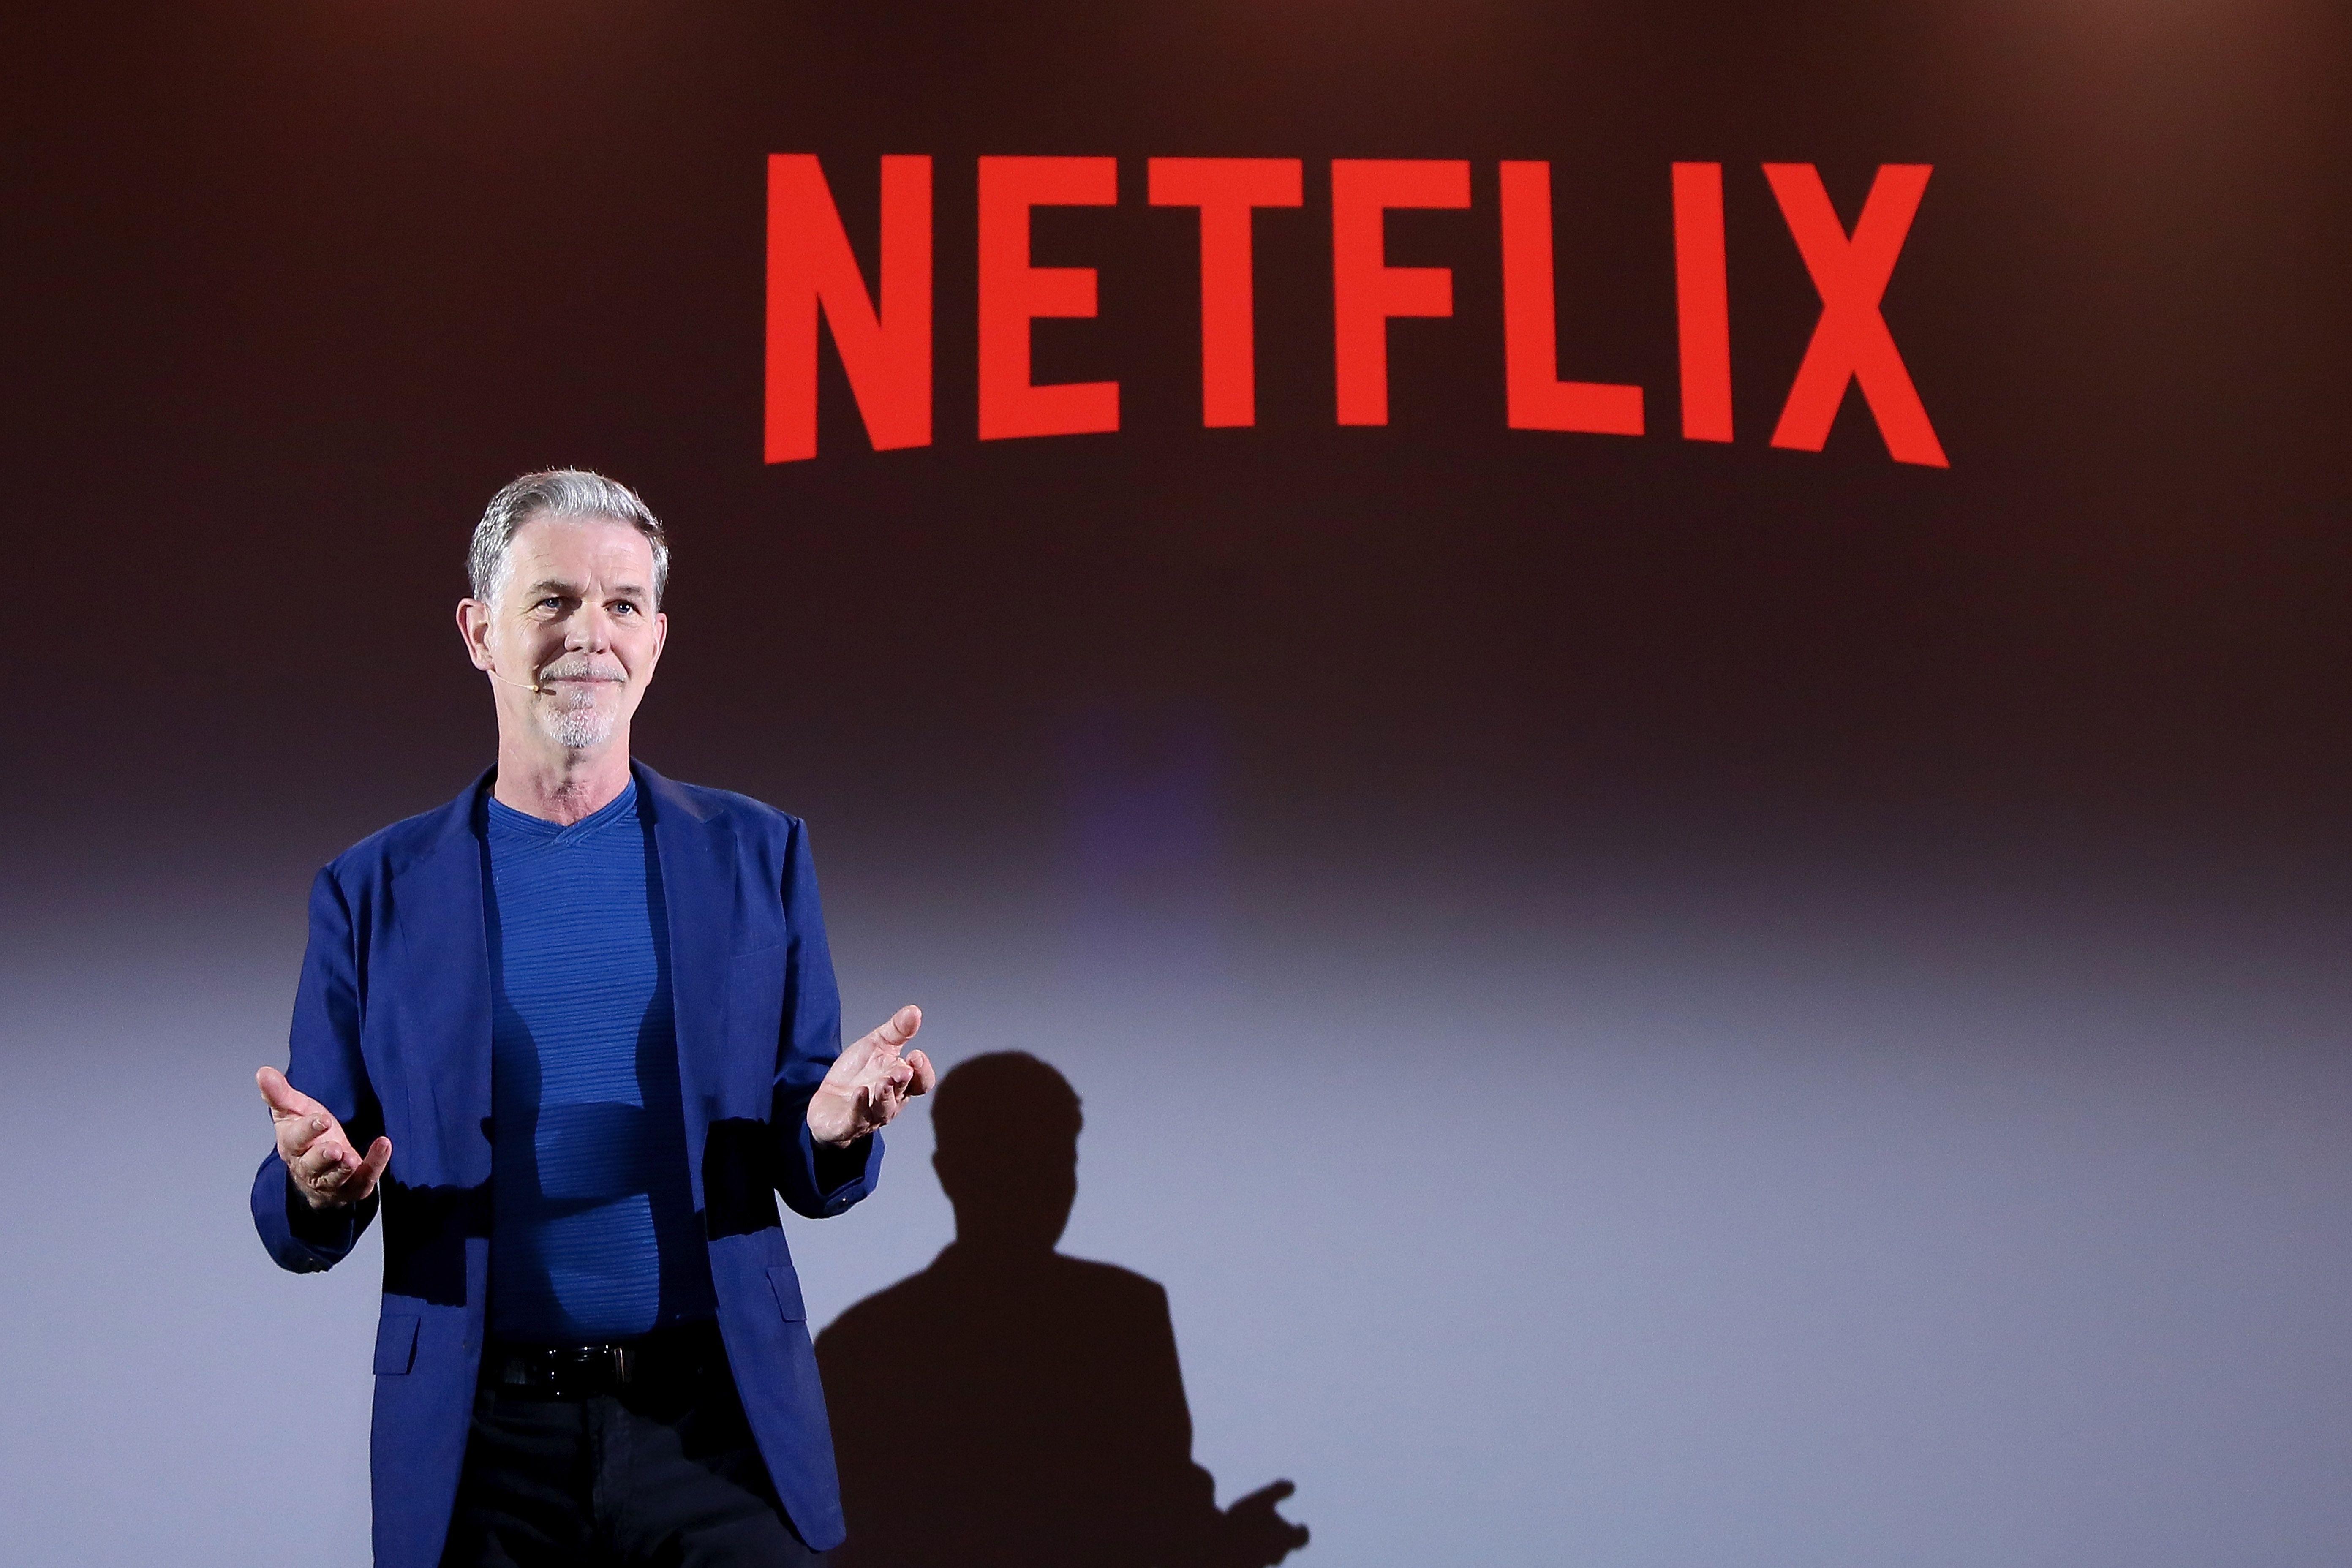 Netflix is still saying 'no' to ads in 2020 Netflix